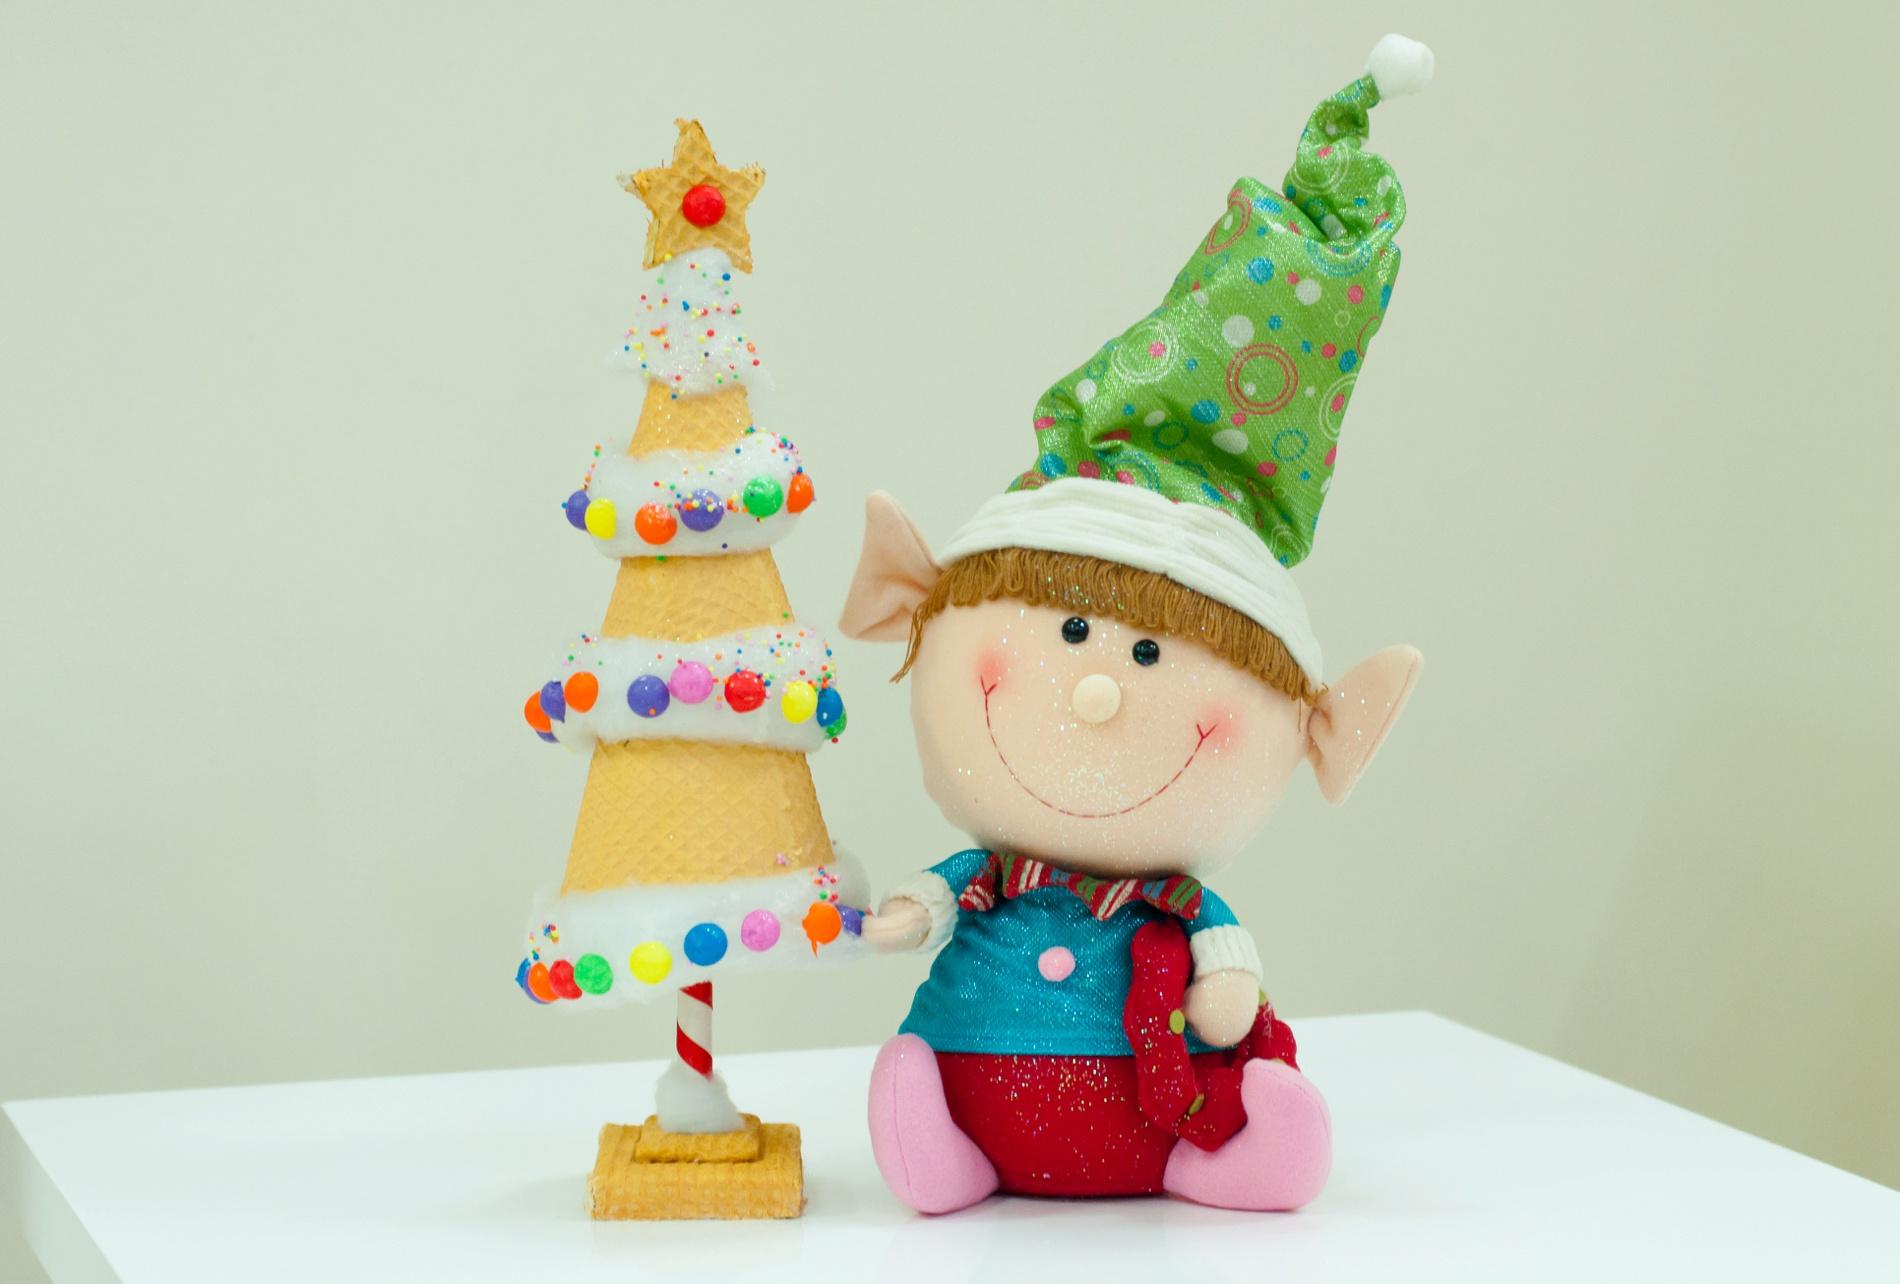 Motivos Para Decorar En Navidad Ideas Del Hogar - Motivos-navidad